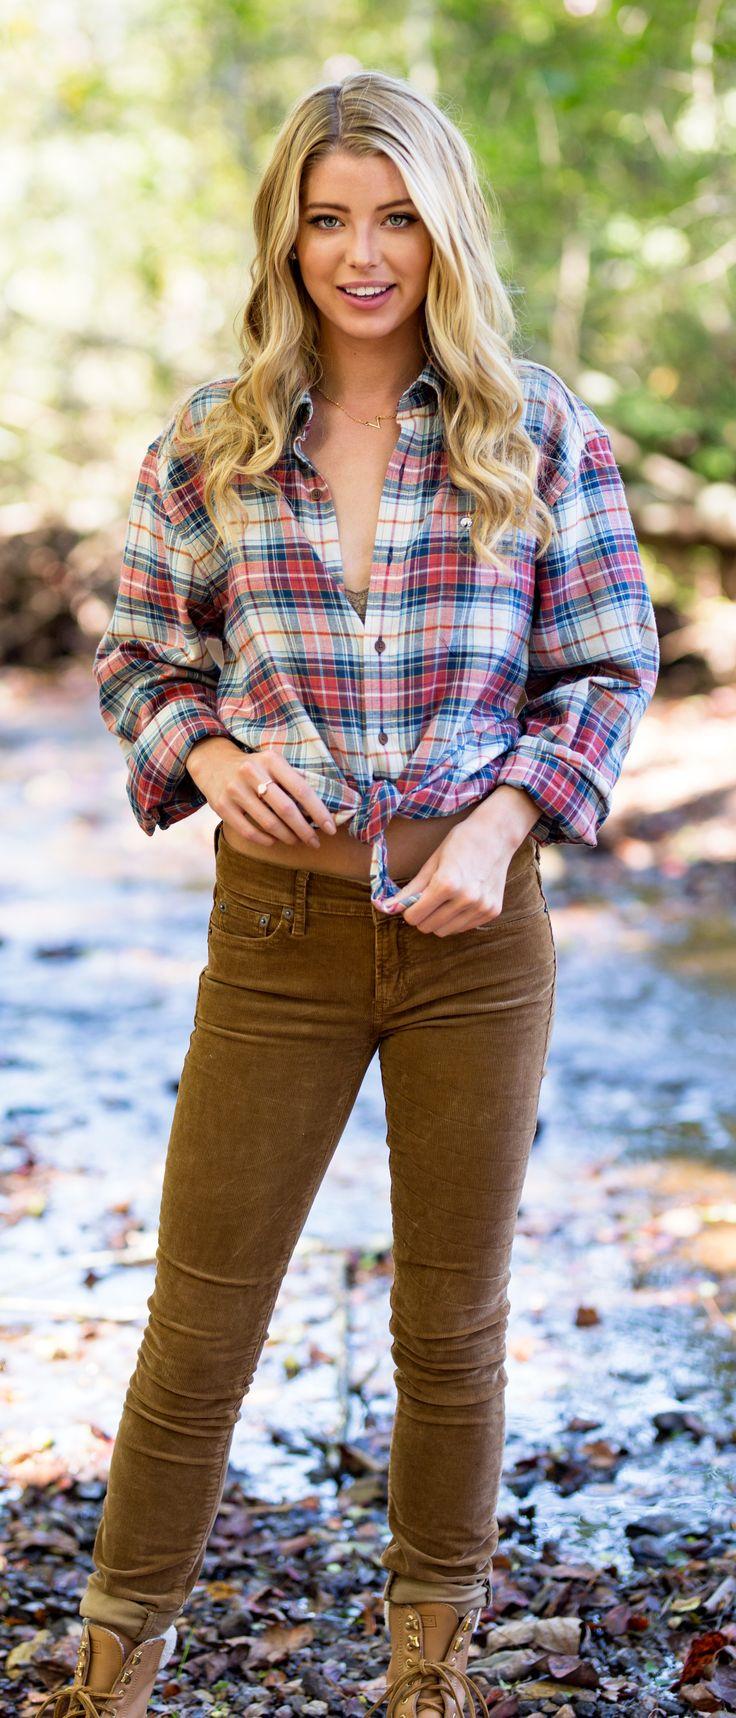 #southernshirt #fallfashion #winterfashion #womensfashion #comfy #flannel #outfit #enjoythegoodlife